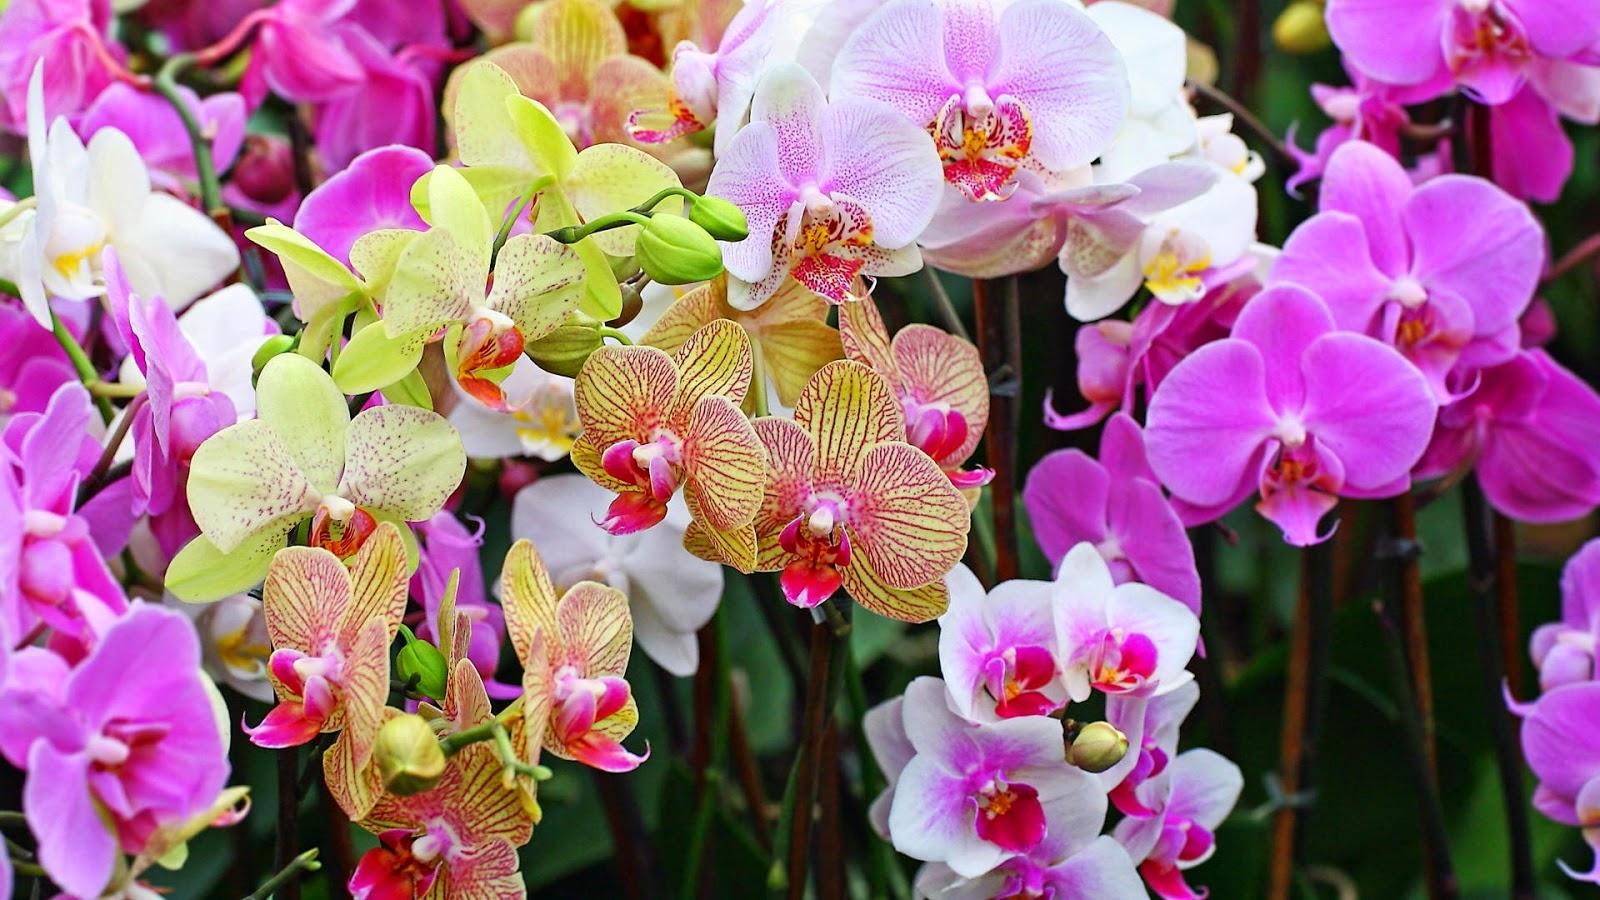 20 Gambar Foto Bunga Anggrek Yang Cantik Sealkazz Blog